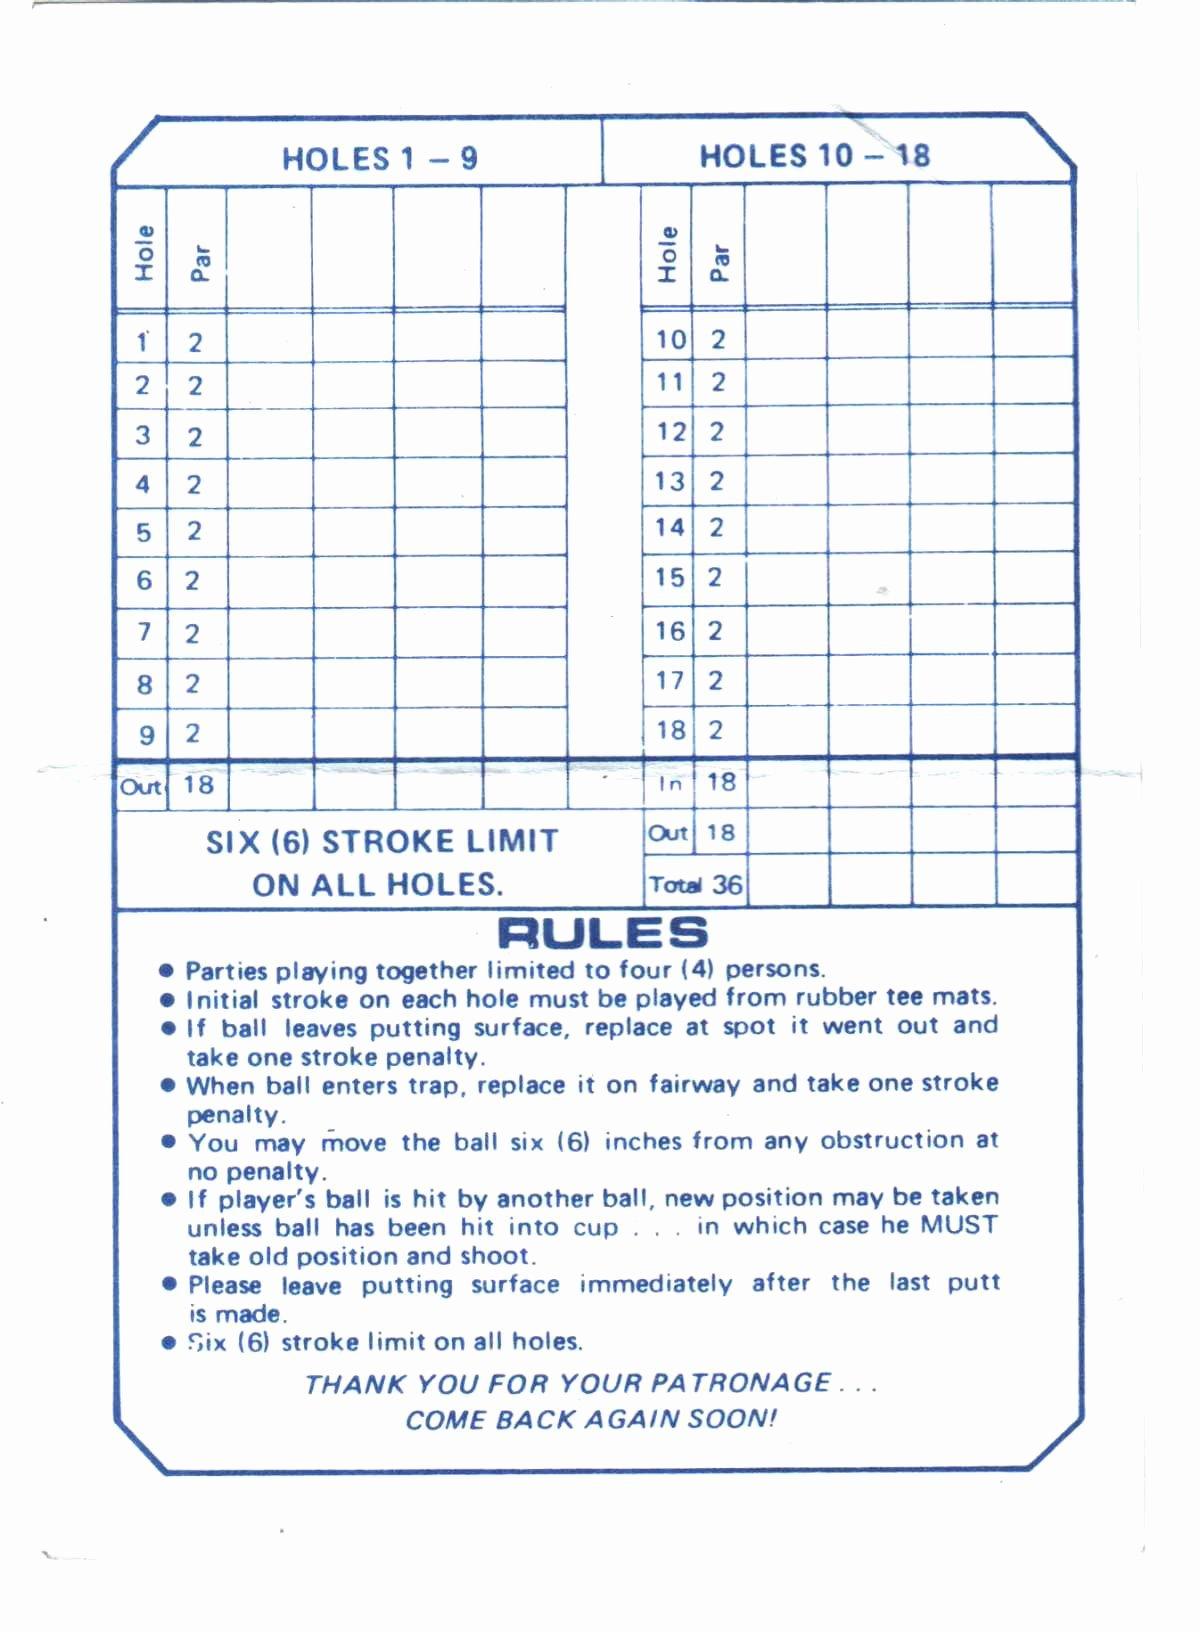 Mini Golf Score Card Inspirational Score Cards Of Crazy Golf Miniature Golf and Adventure